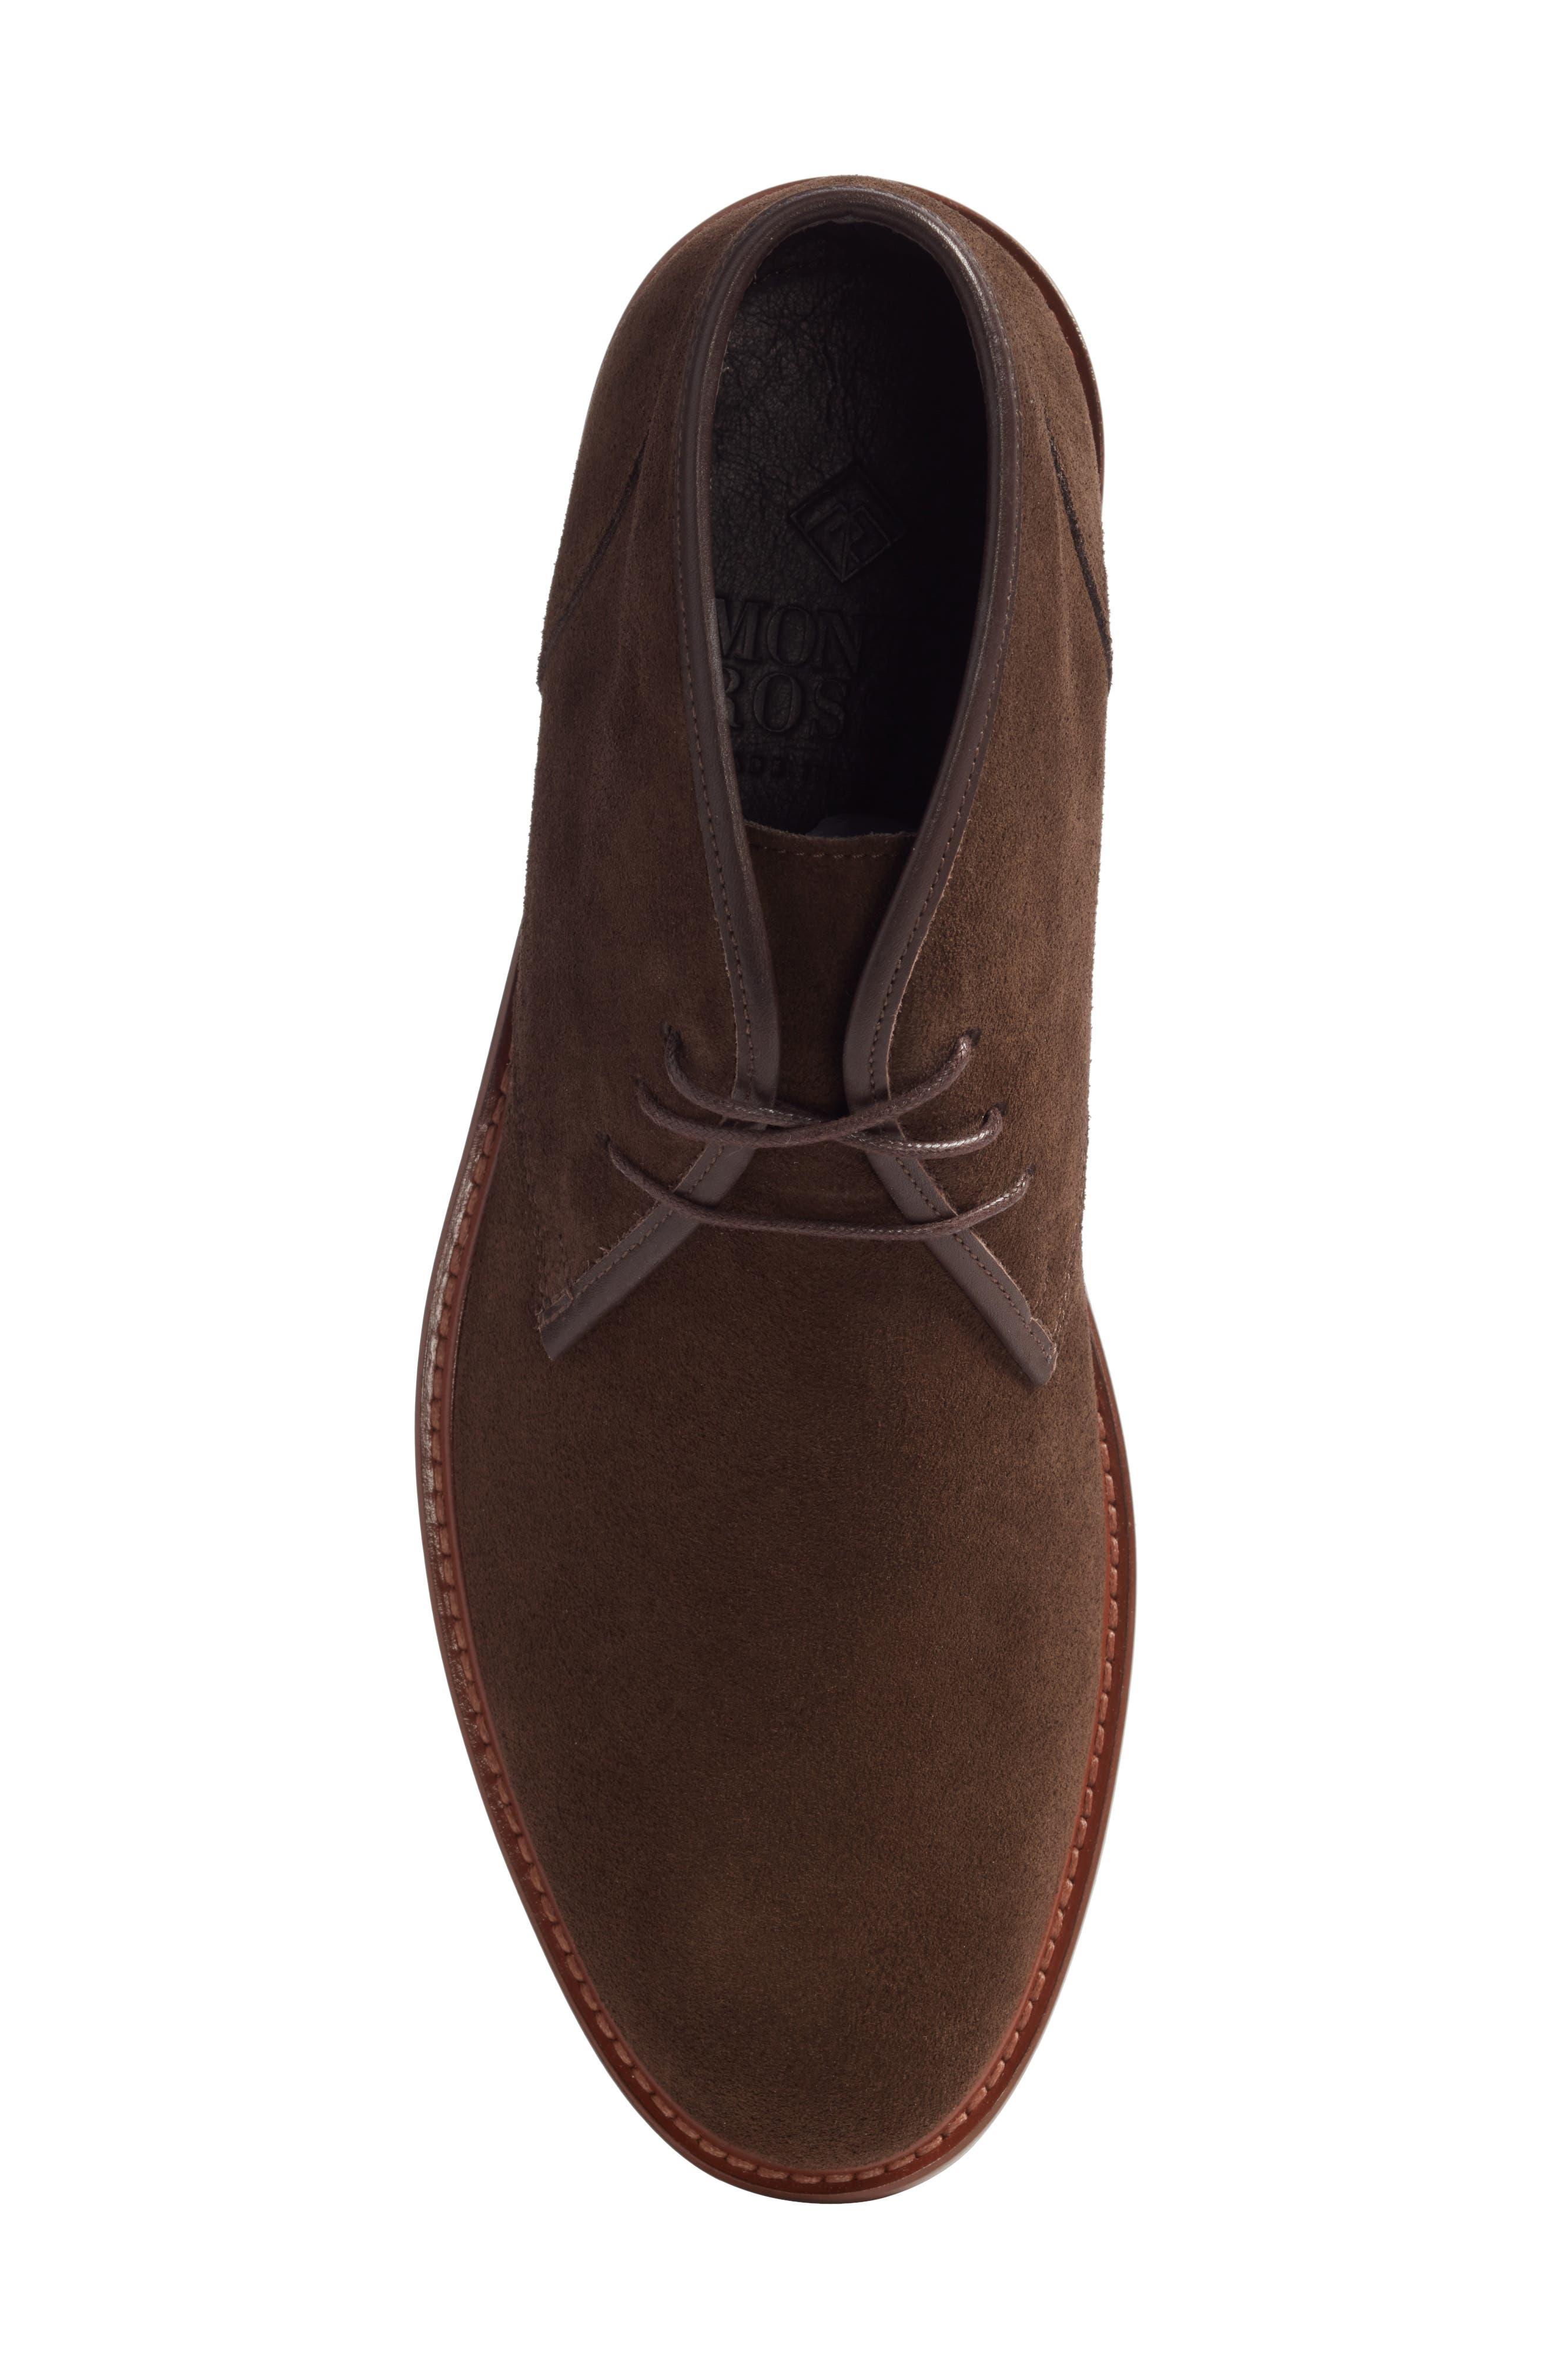 Brixen Waterproof Chukka Boot,                             Alternate thumbnail 5, color,                             Brown Suede